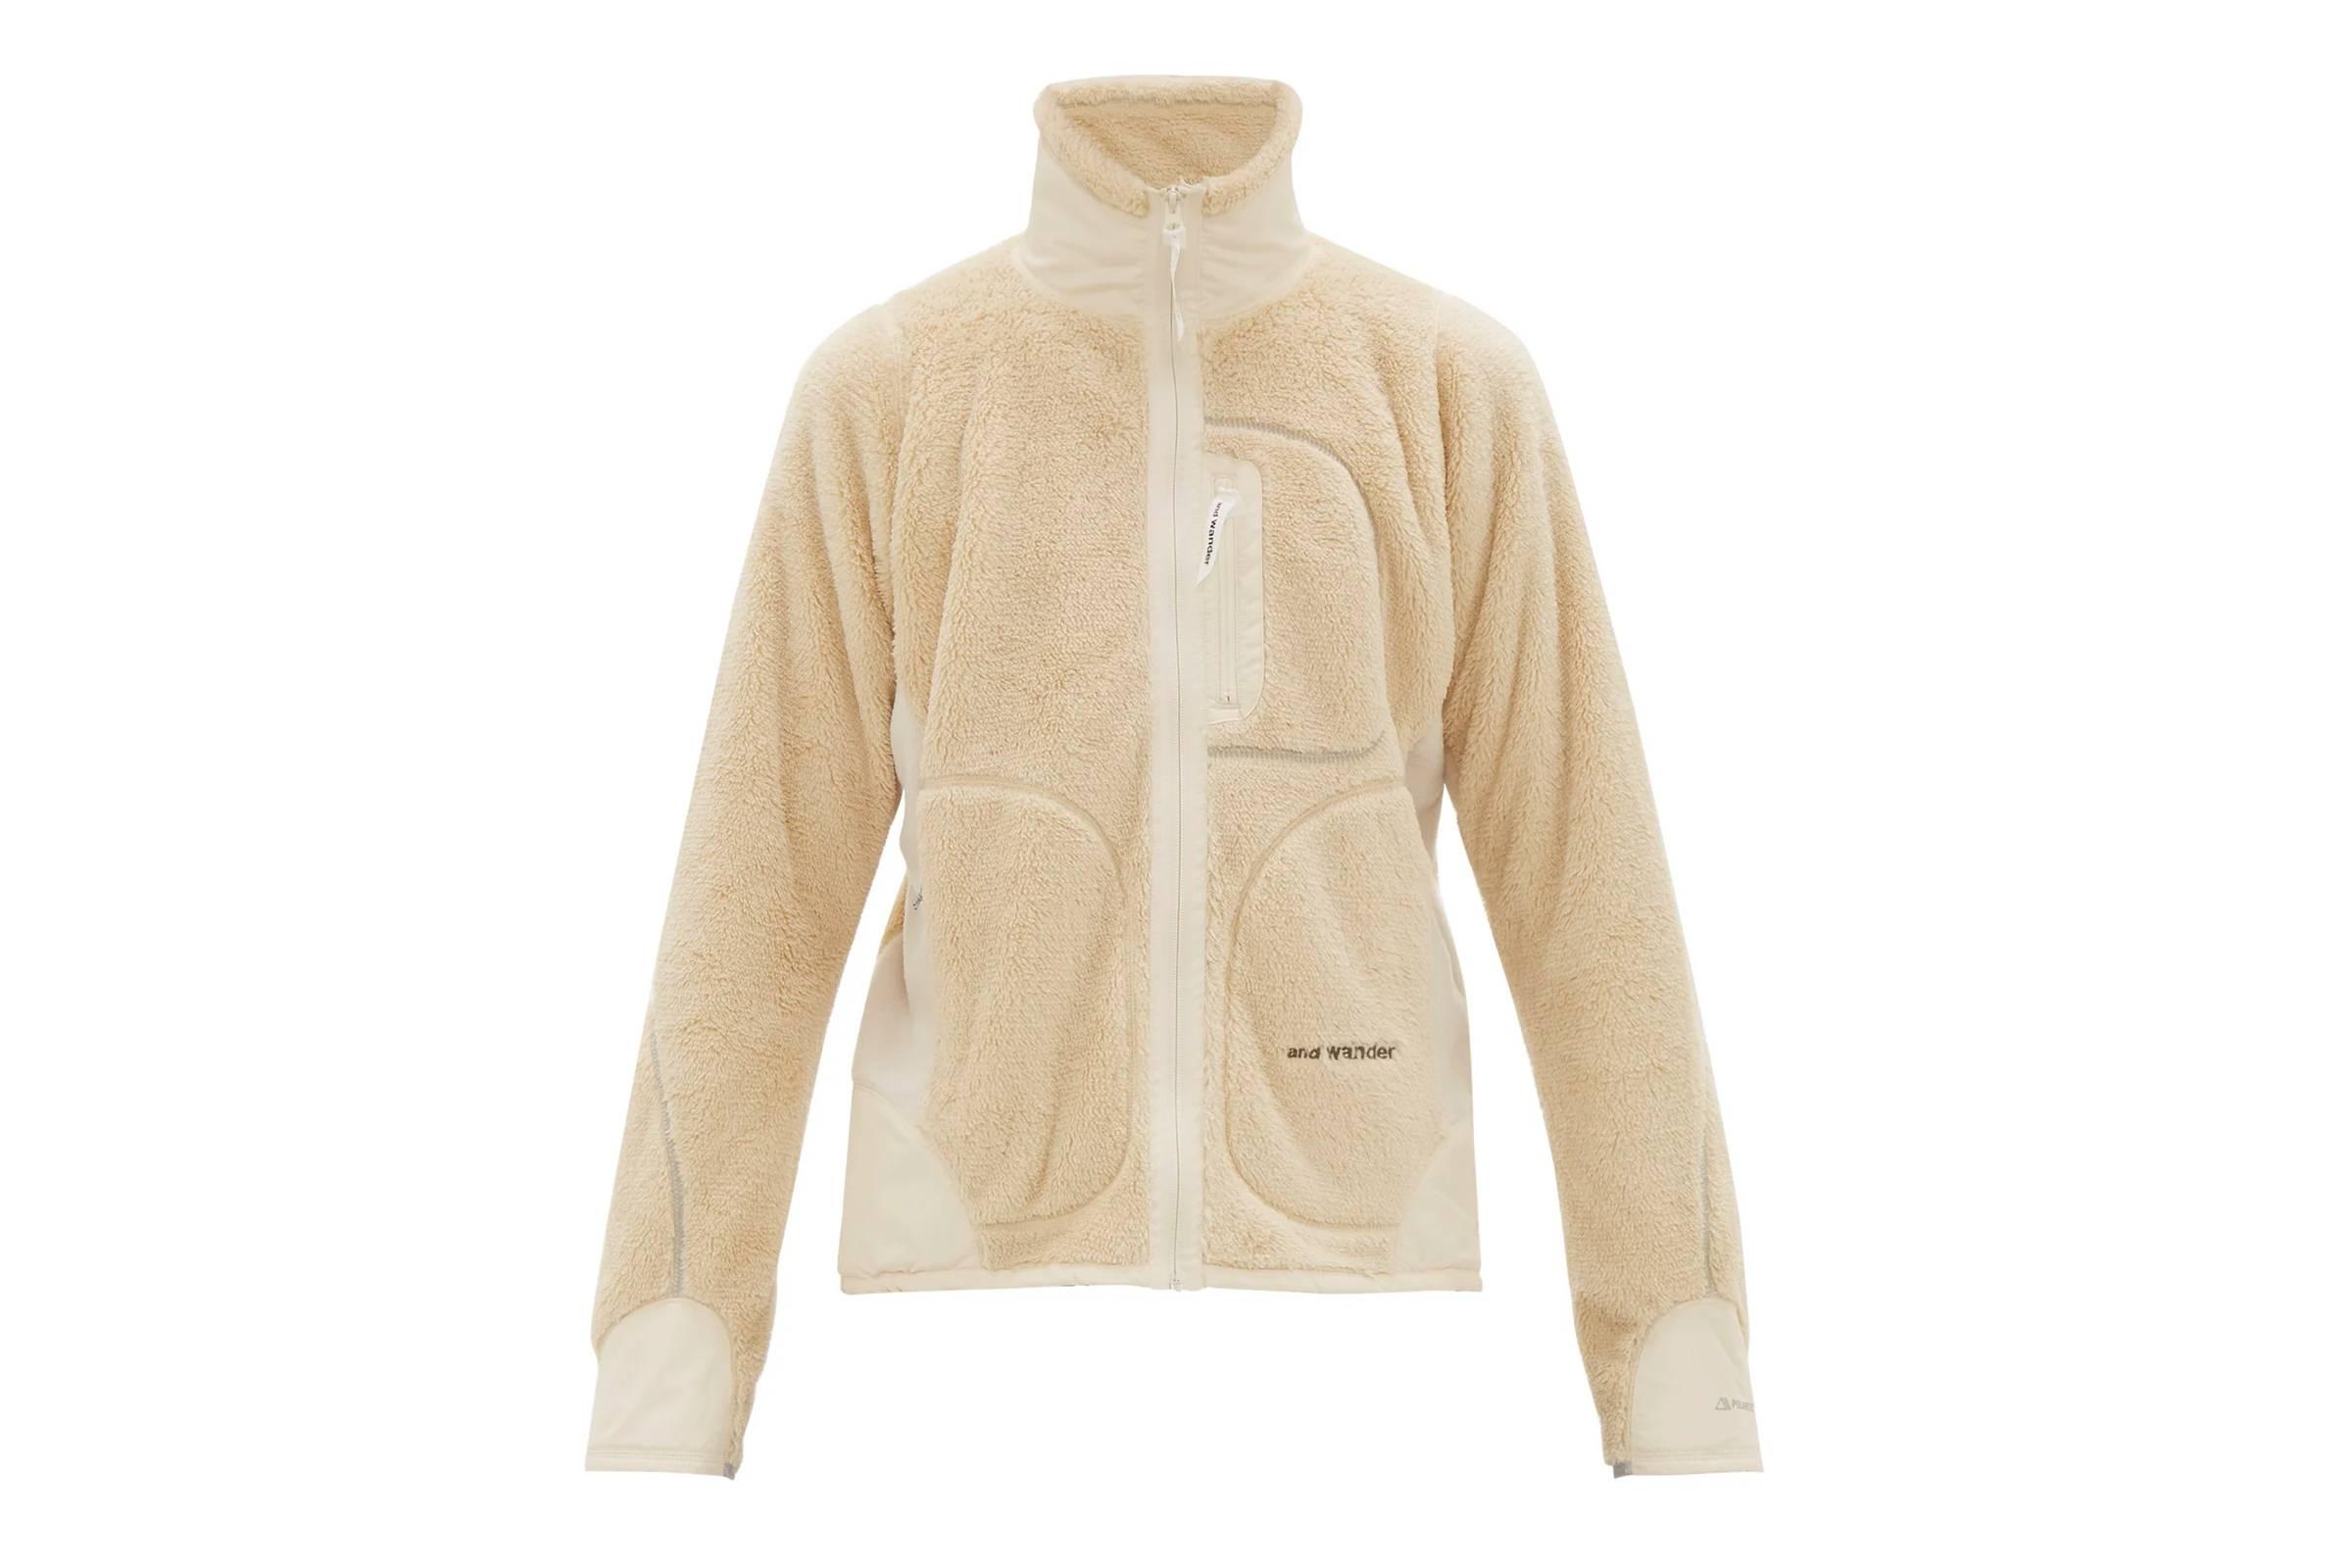 and Wander High Loft Fleece Jacket